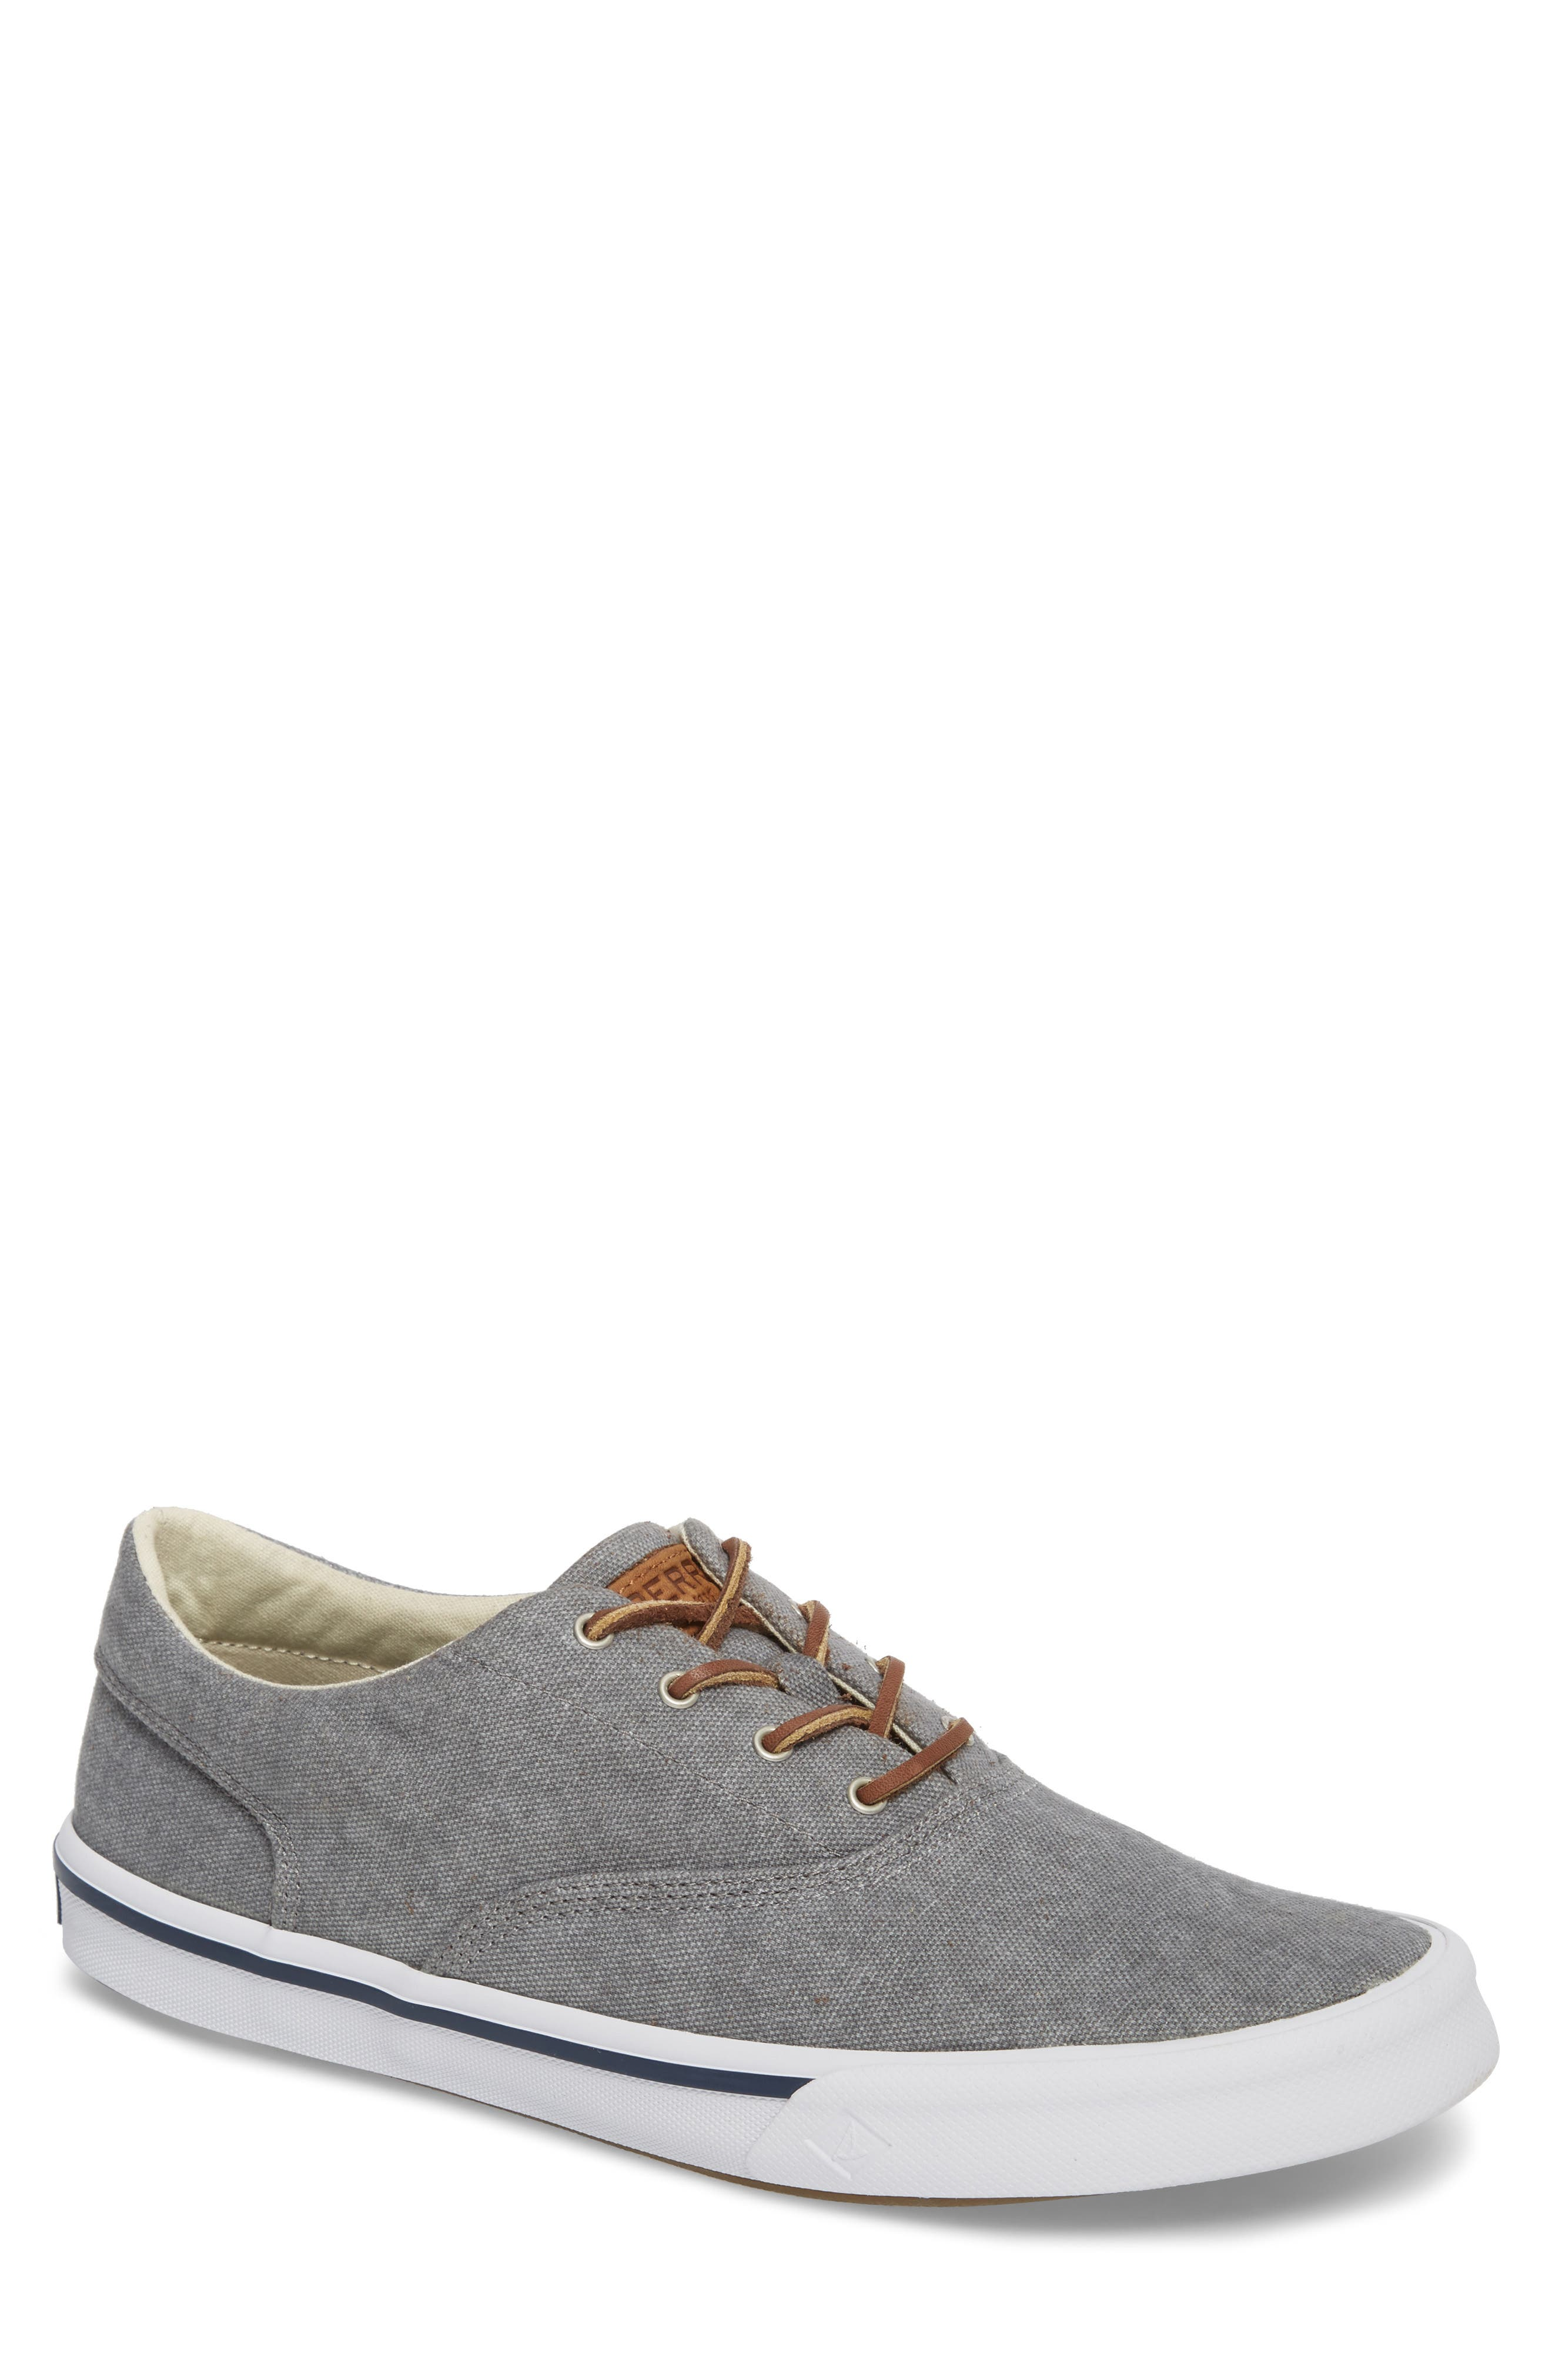 Striper 2 CVO Sneaker,                         Main,                         color, GREY CANVAS